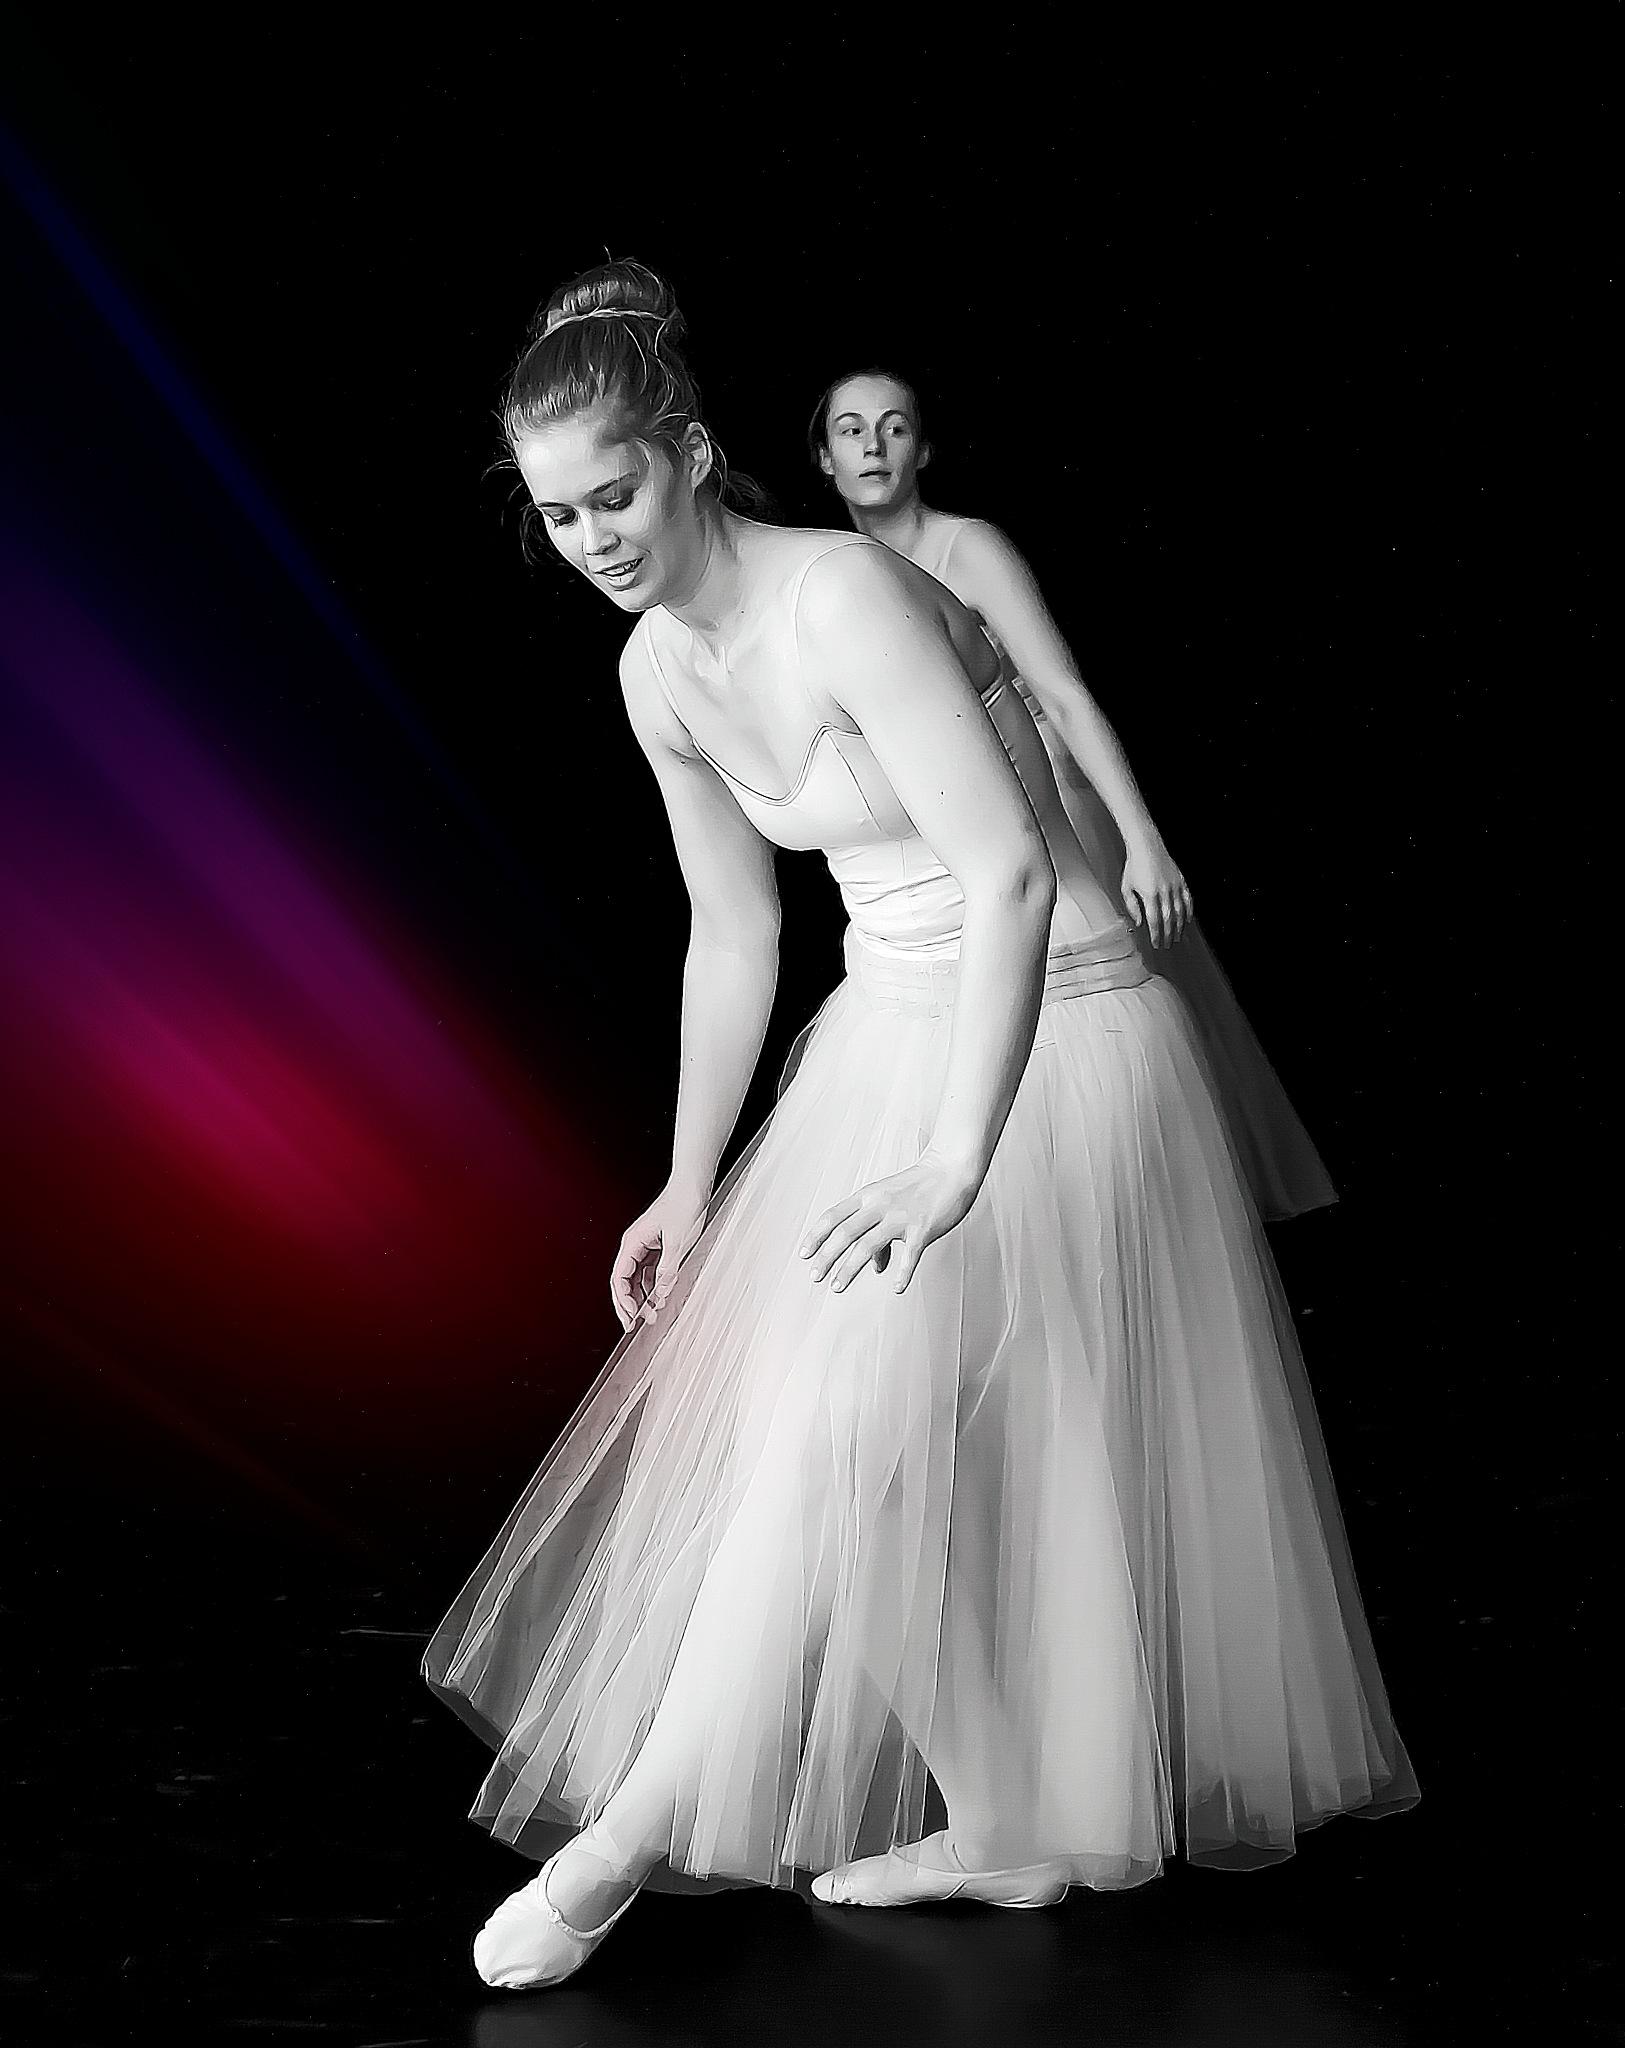 ballet by Renaat